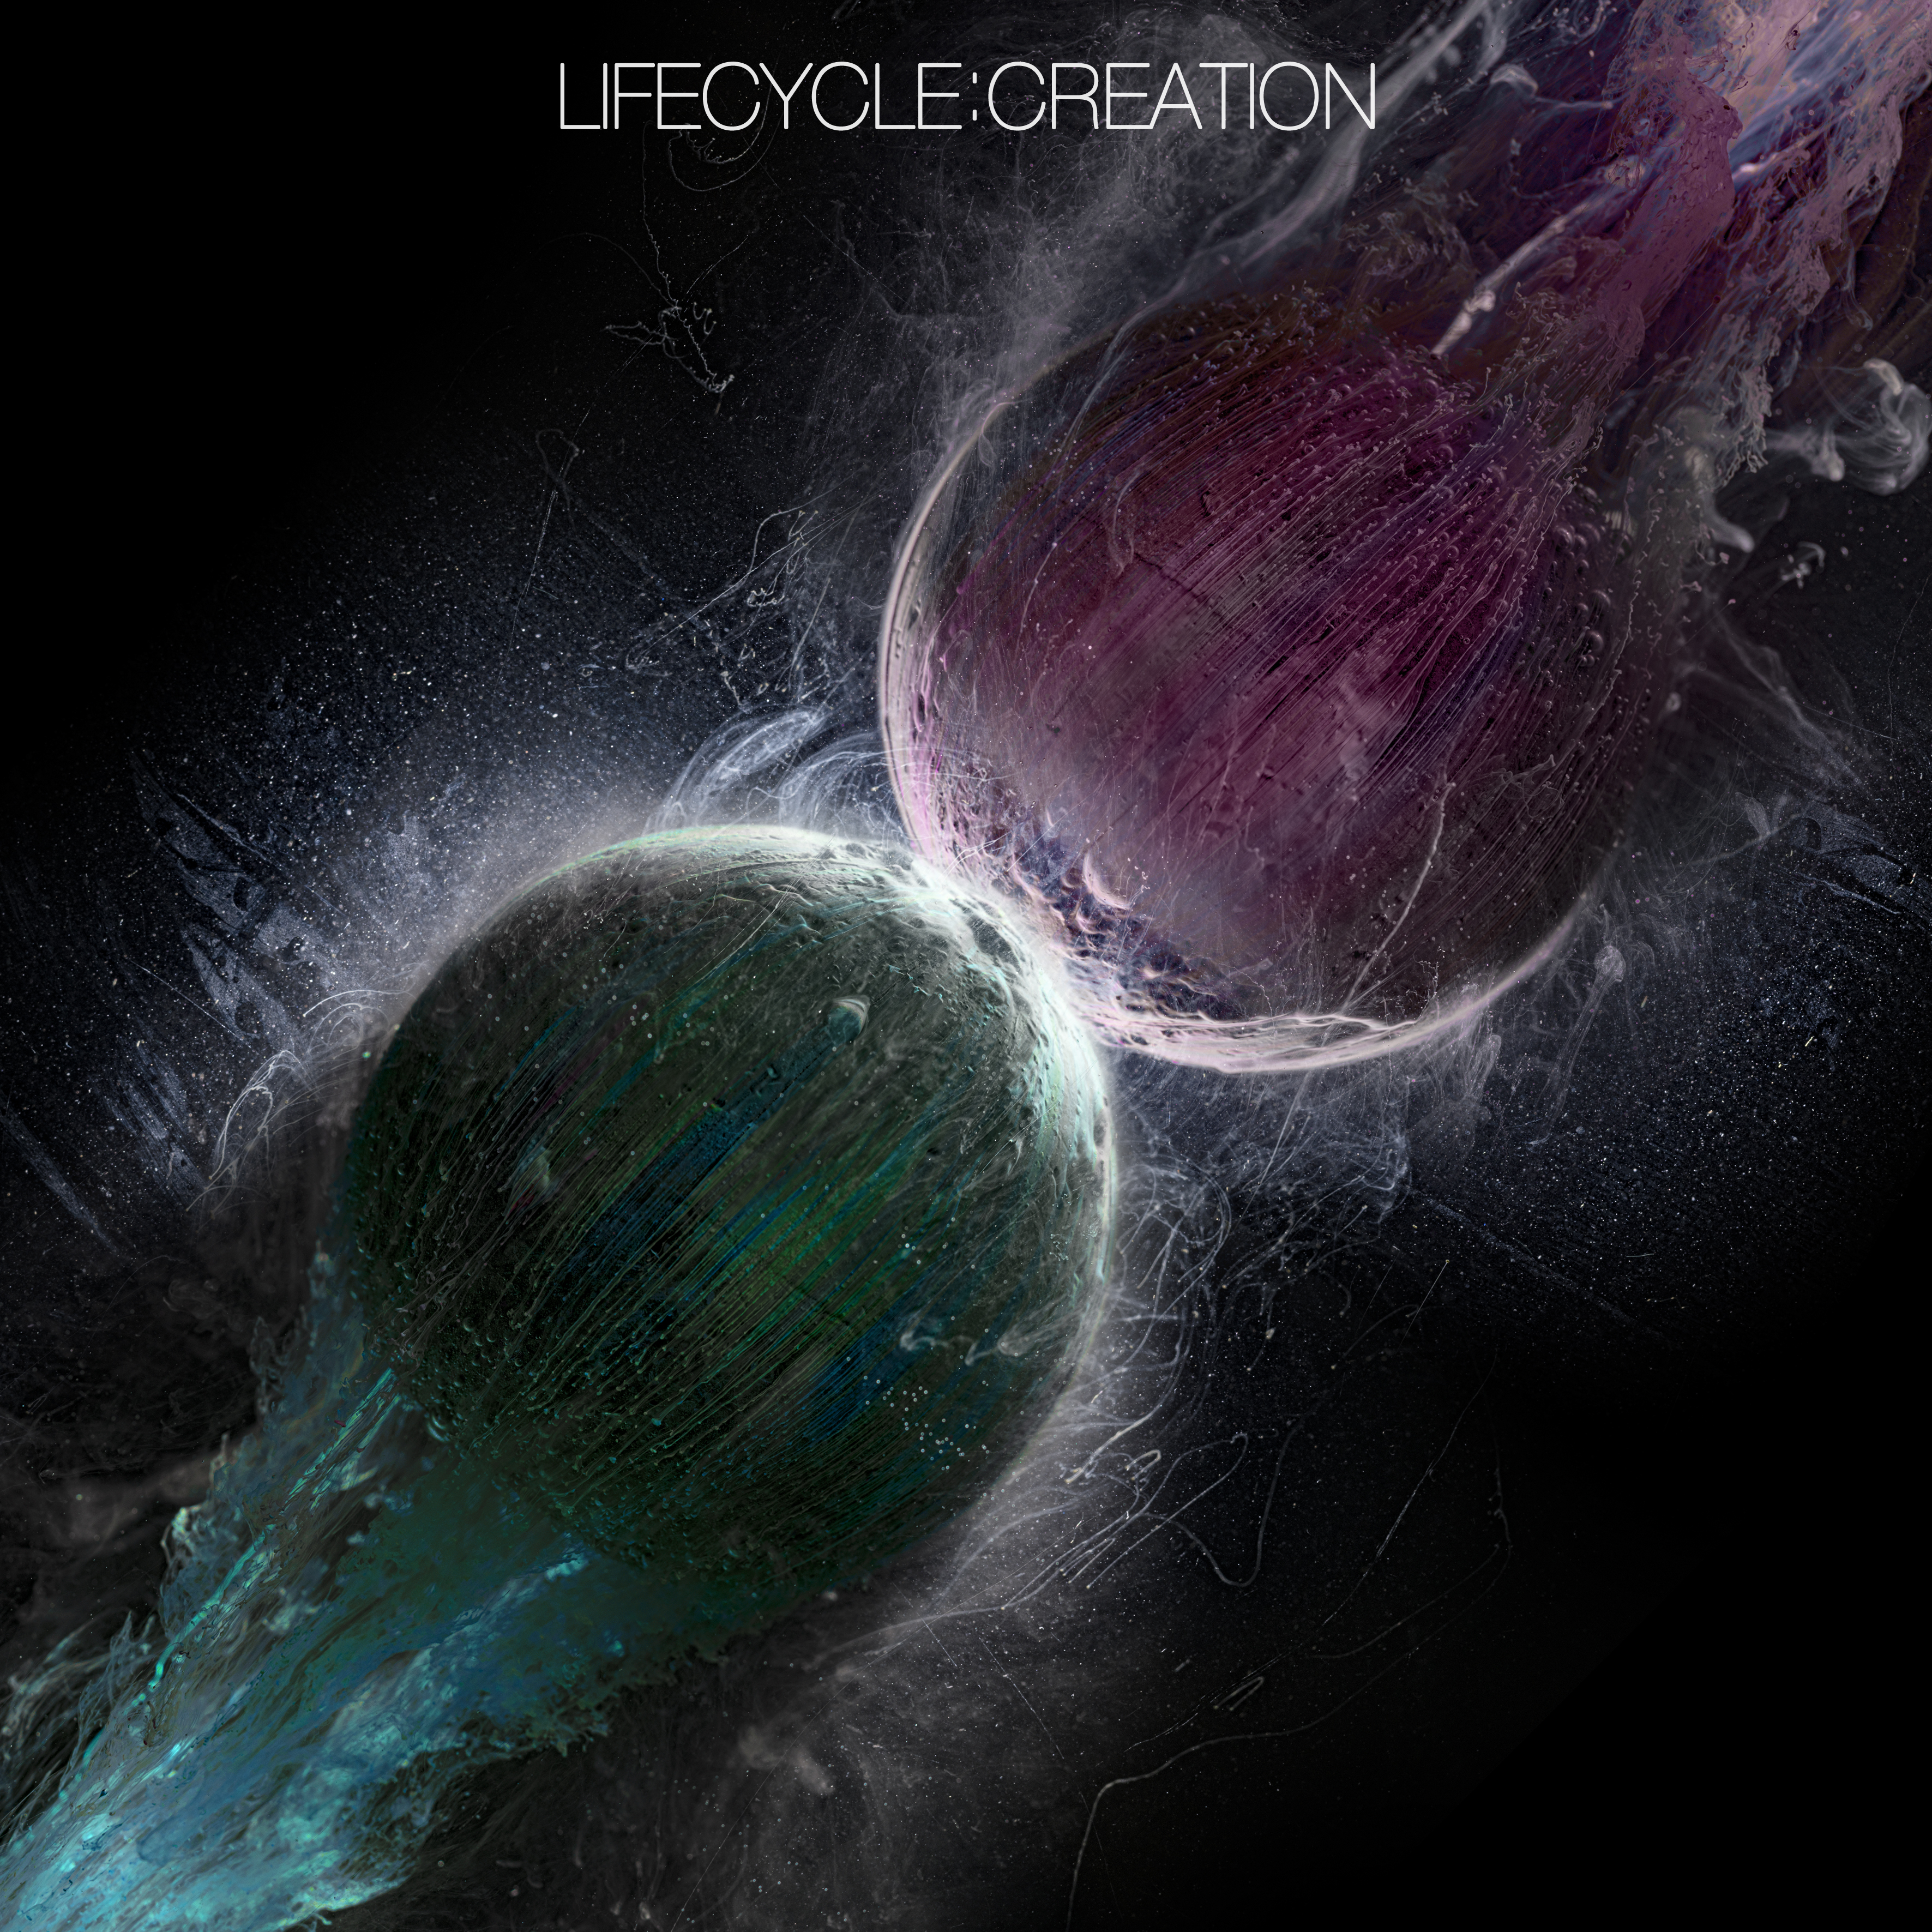 Lifecycle: Creation Image